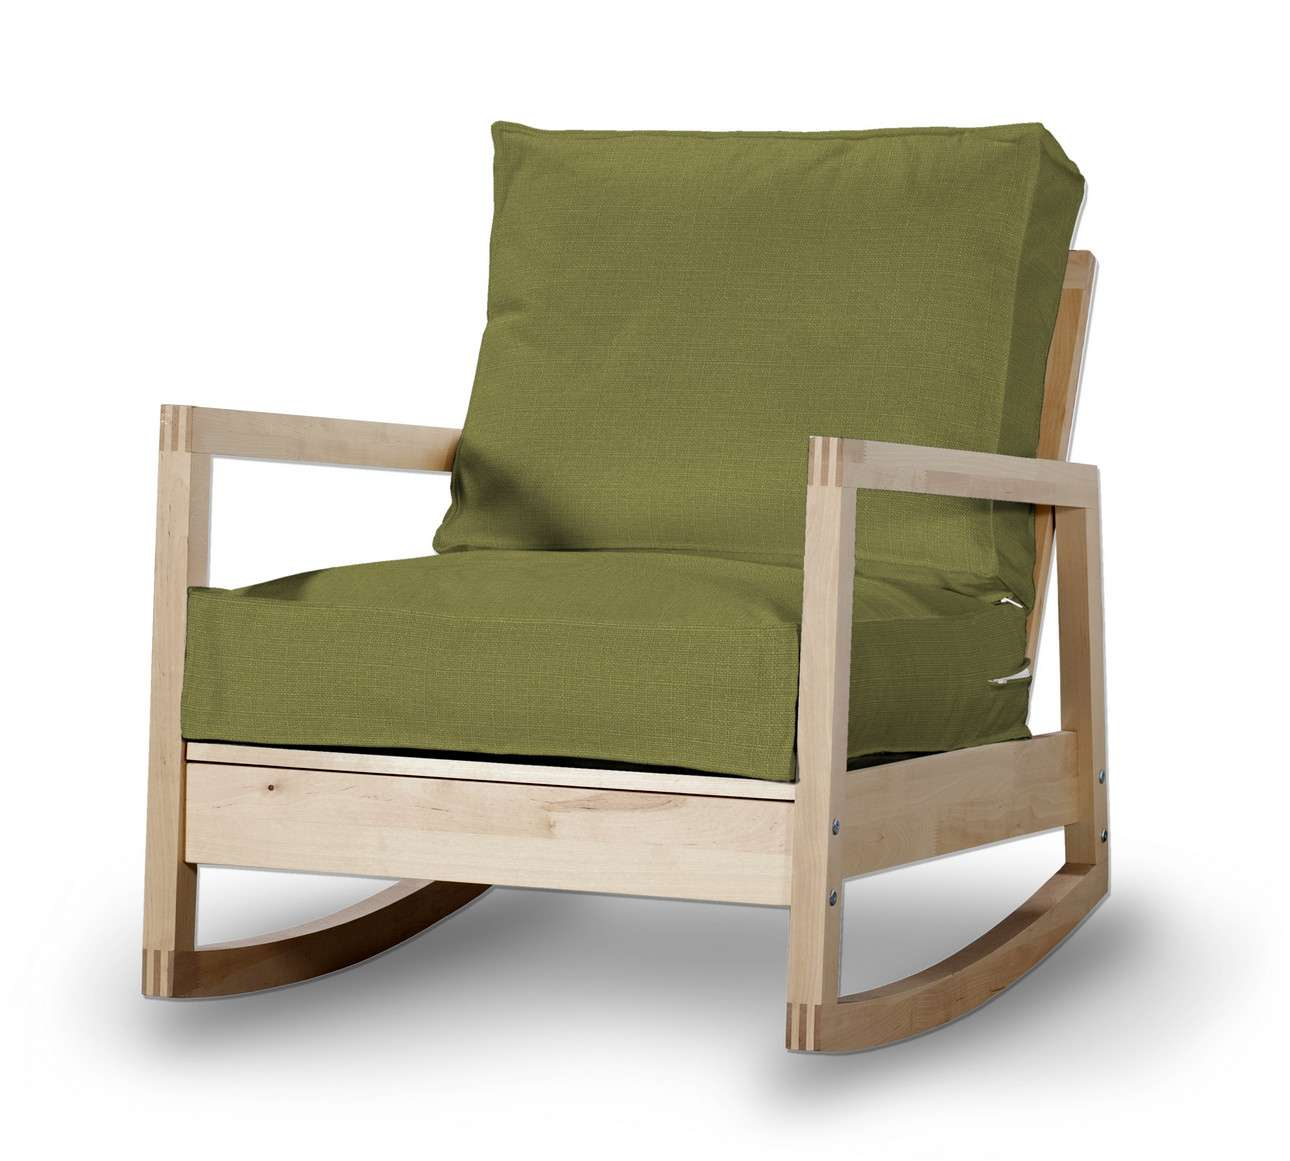 Pokrowiec na fotel Lillberg w kolekcji Living, tkanina: 161-13